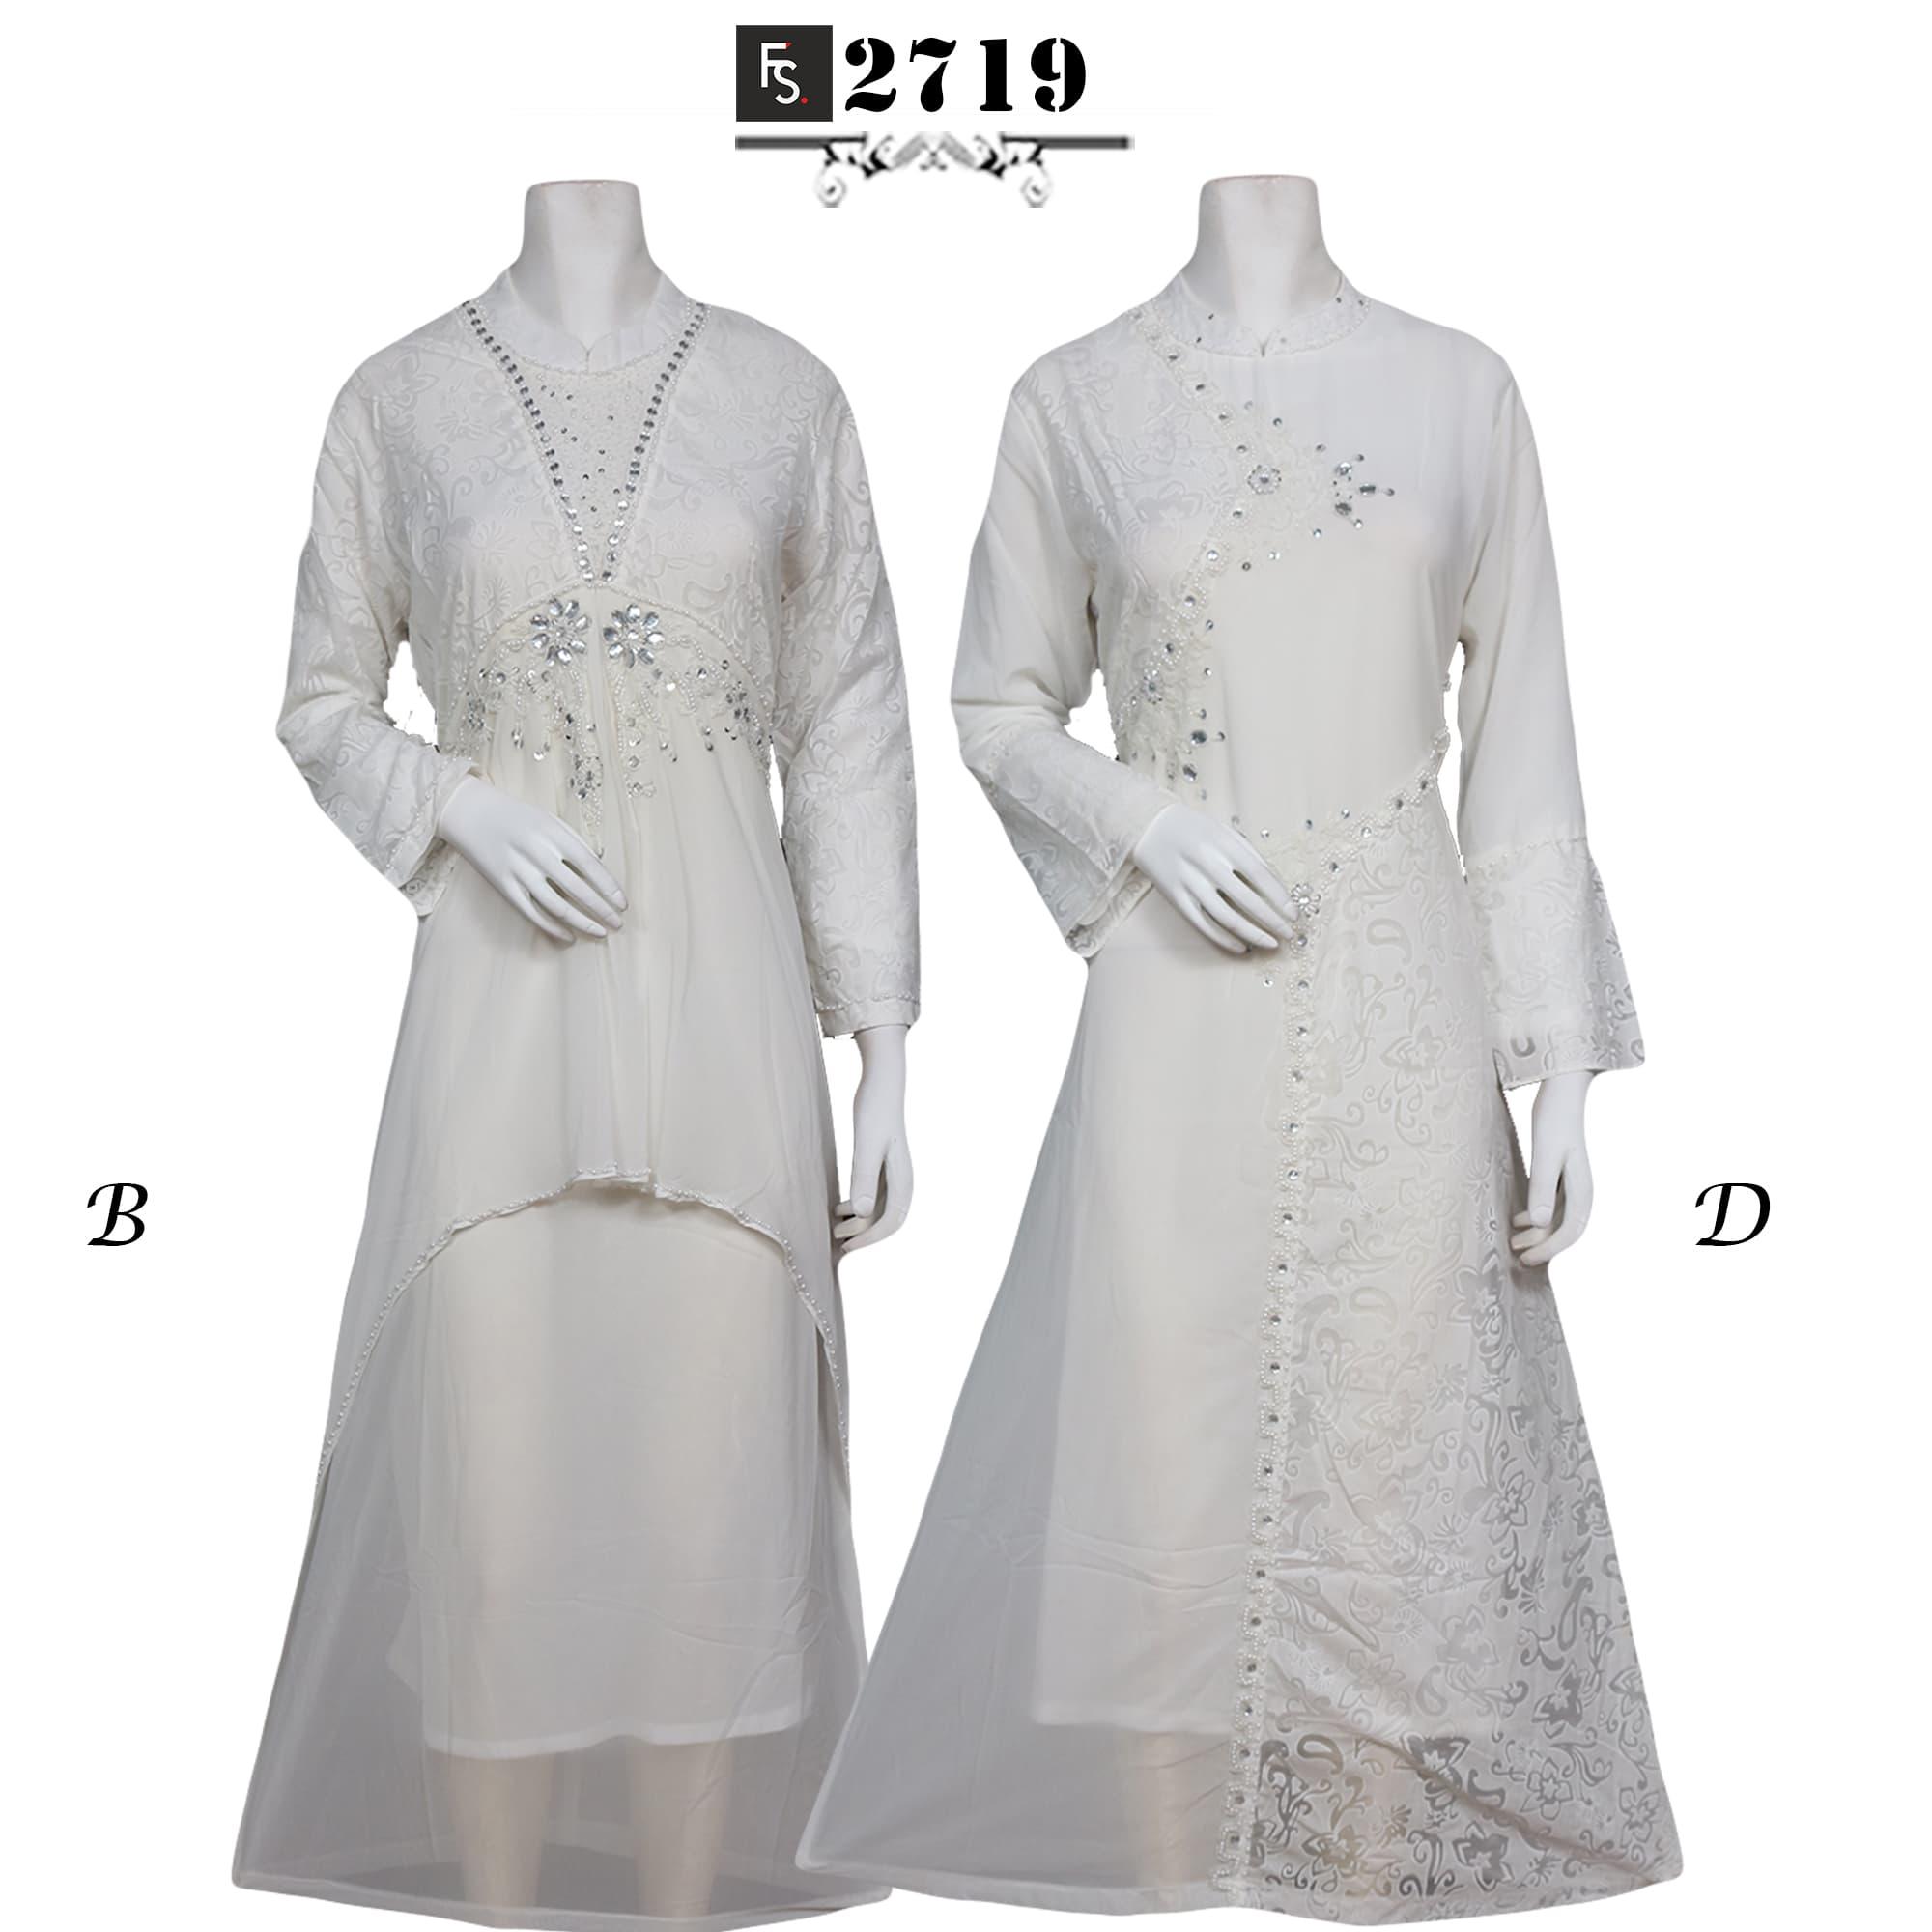 32 Desain Baju Pesta Full Payet | Desaprojek